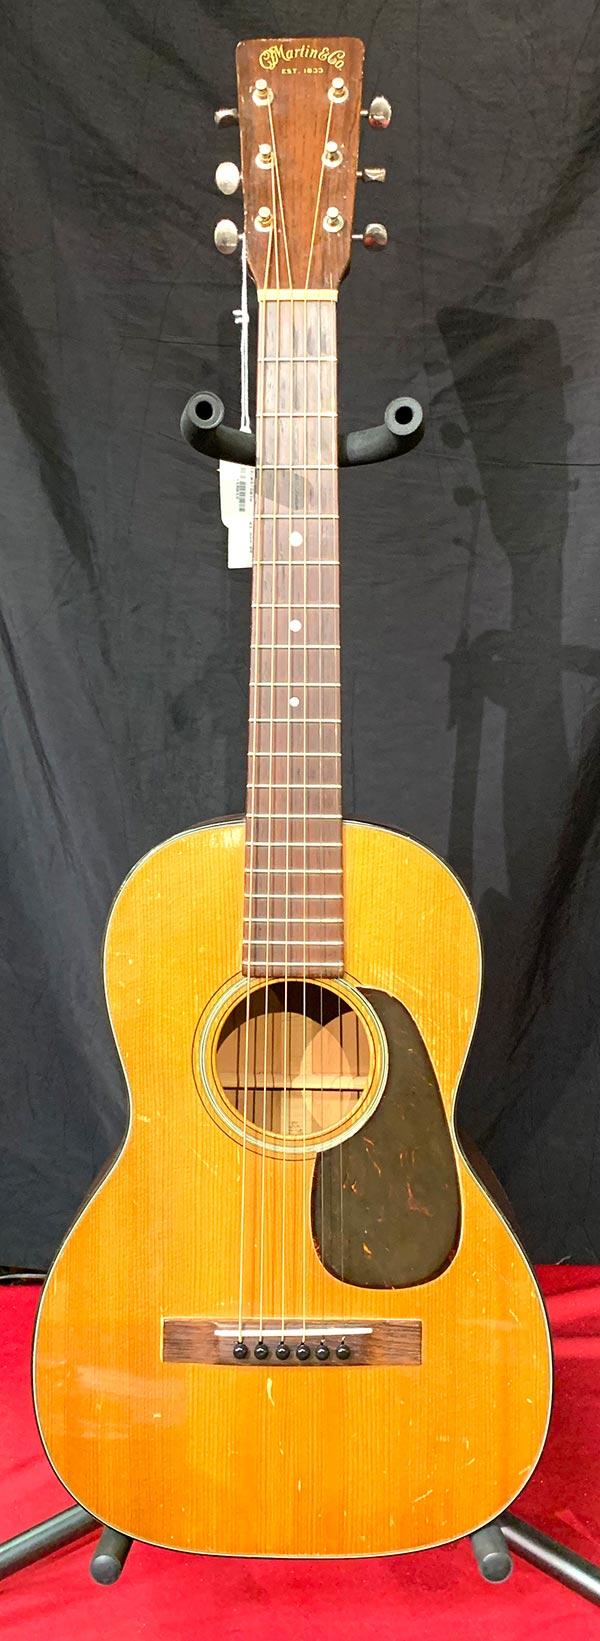 1951 Martin 5-18 Terz